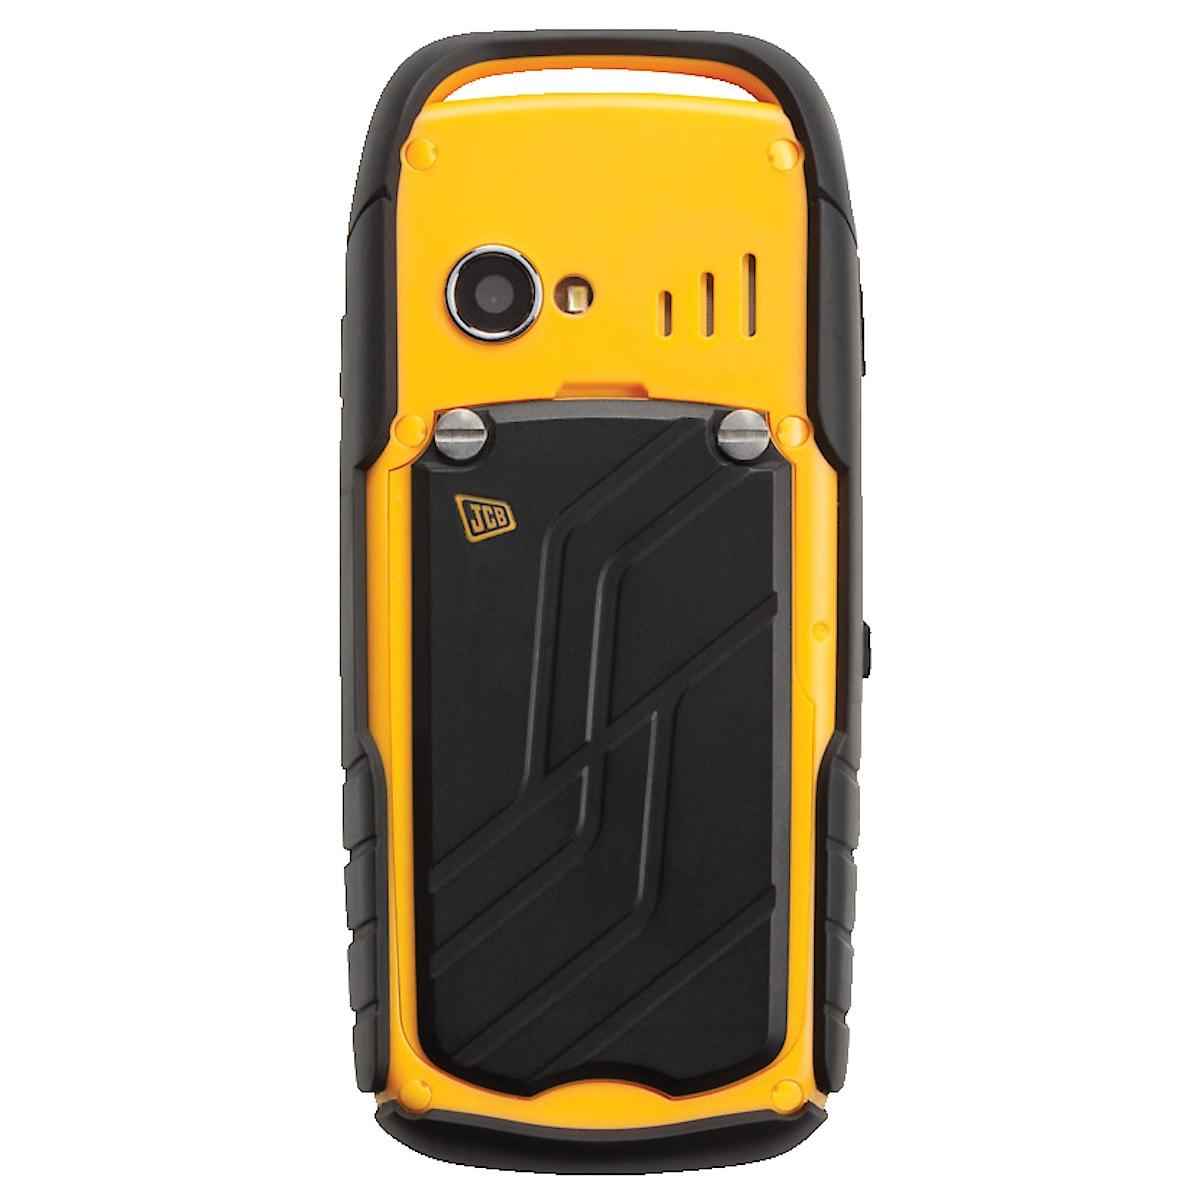 JCB Toughphone Sitemaster2 mobiltelefon